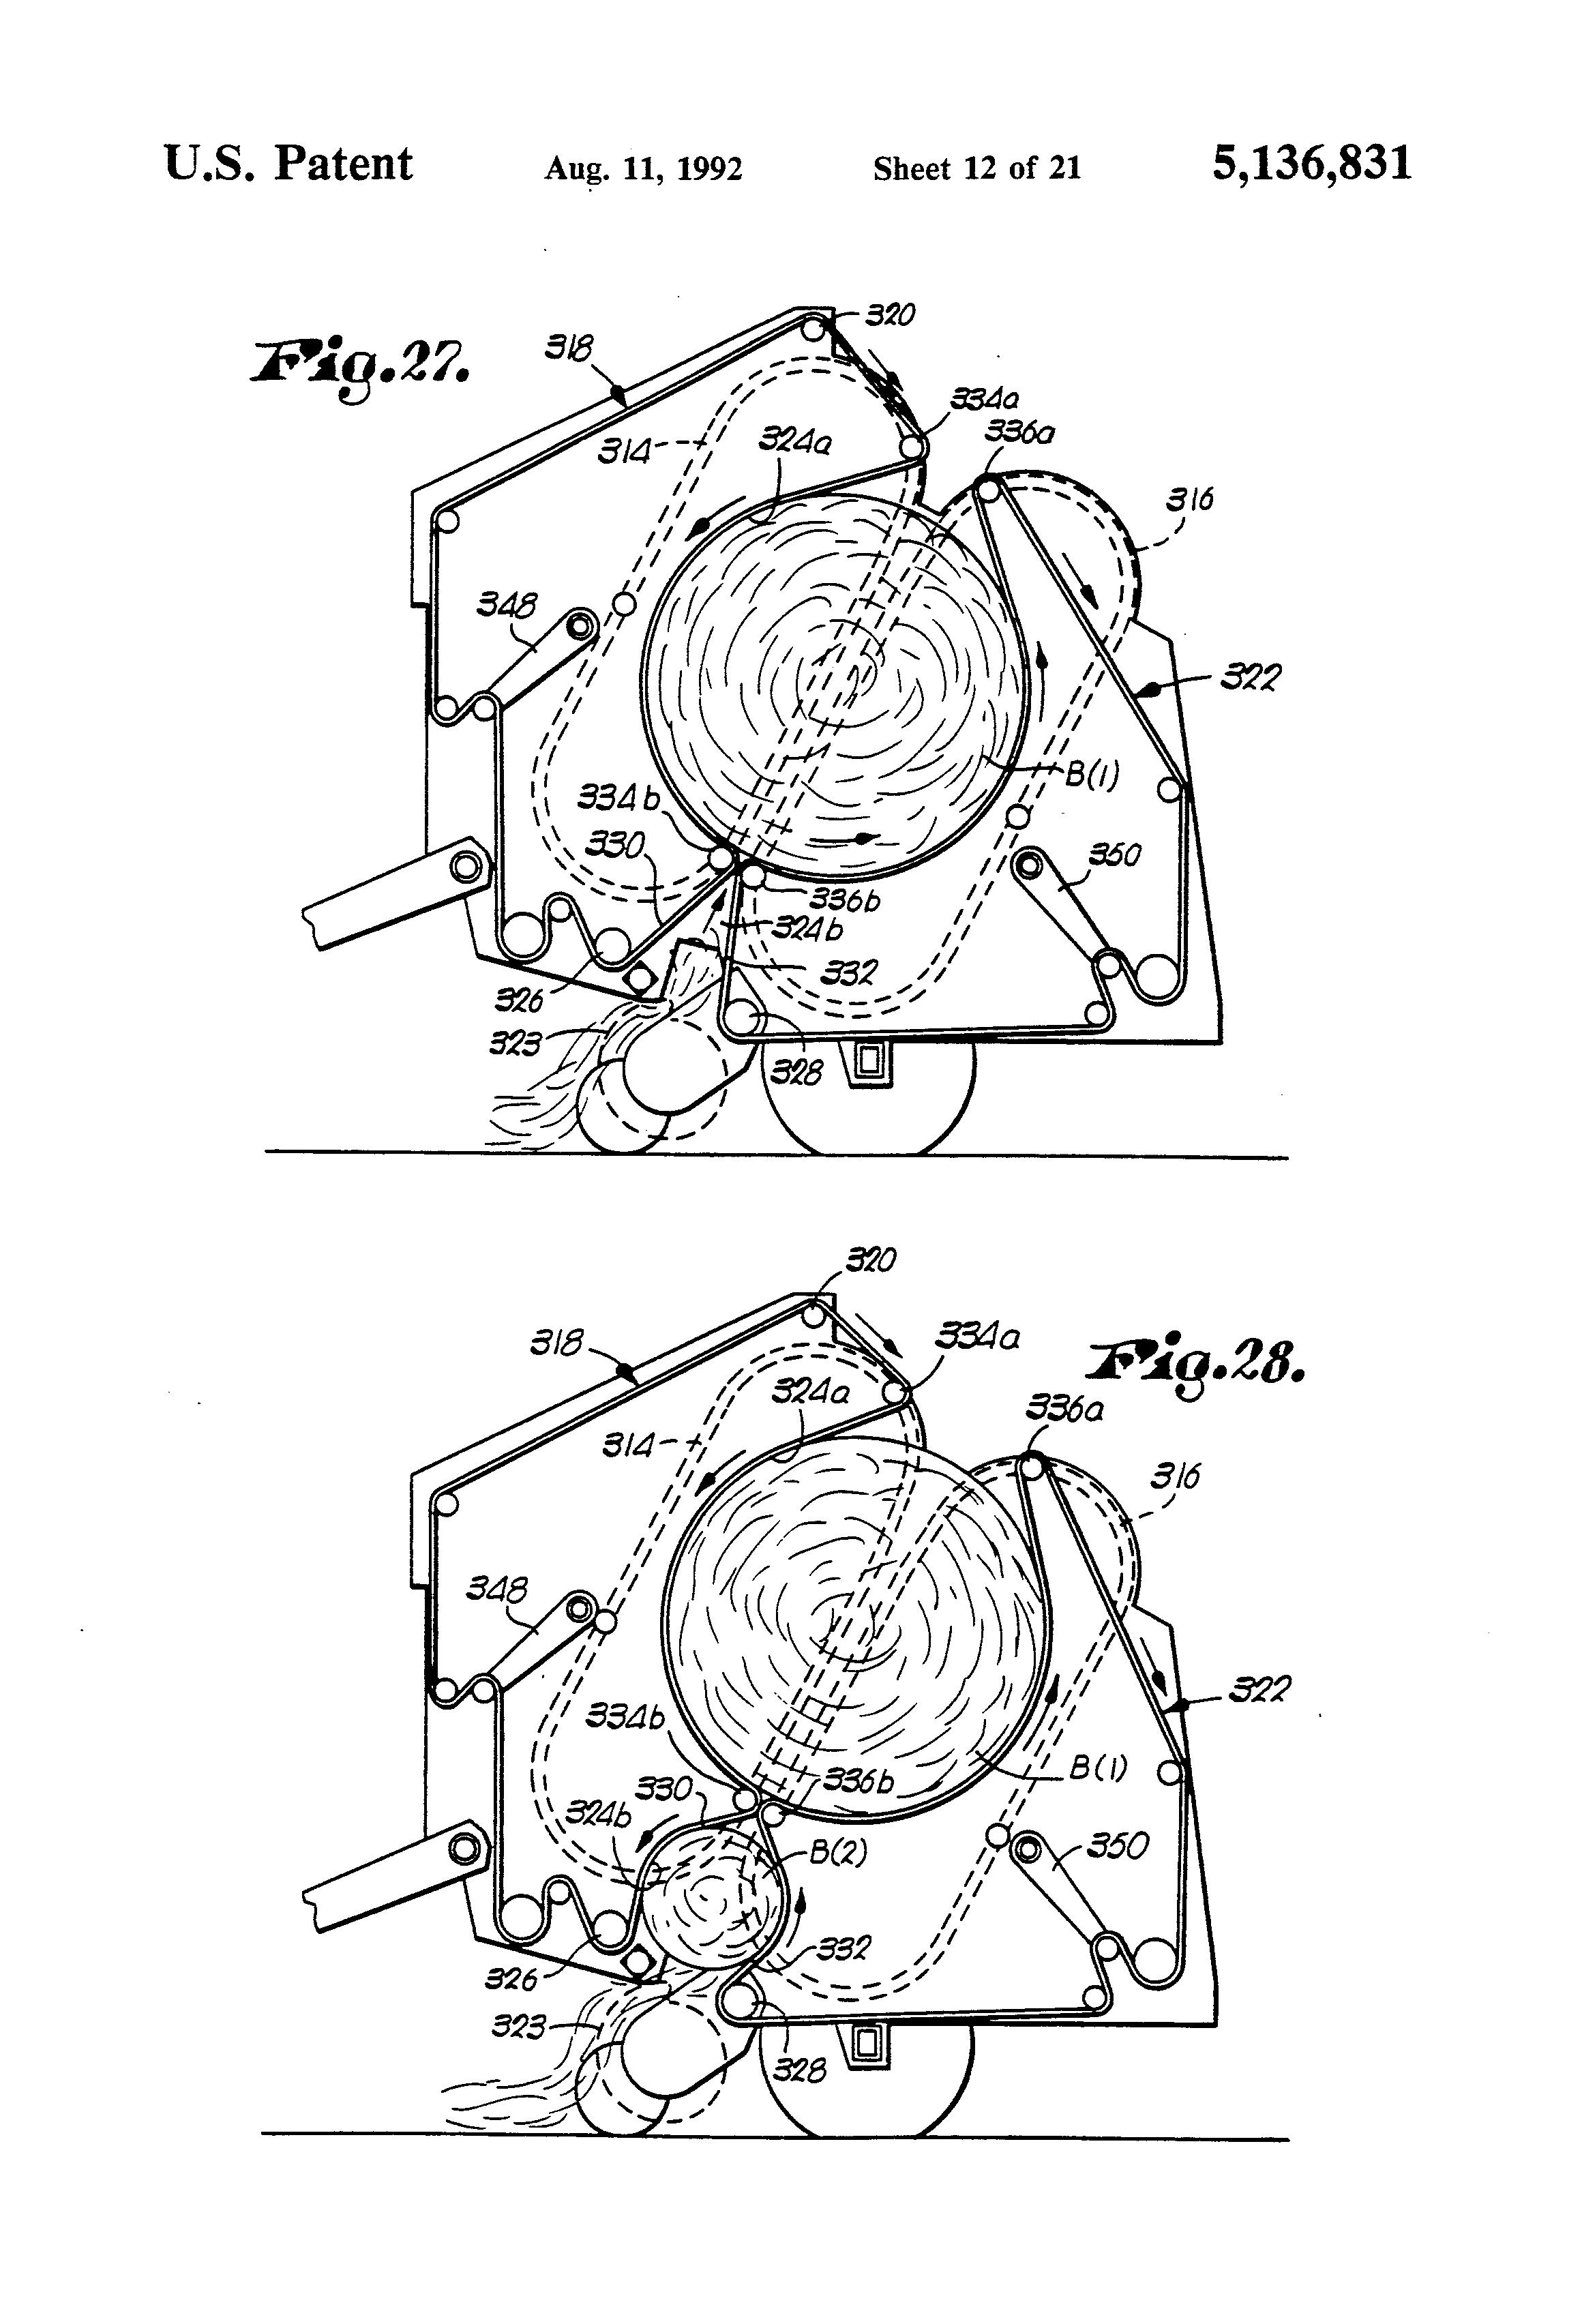 Baler Google Patents On 424 International Tractor Hydraulics Diagram